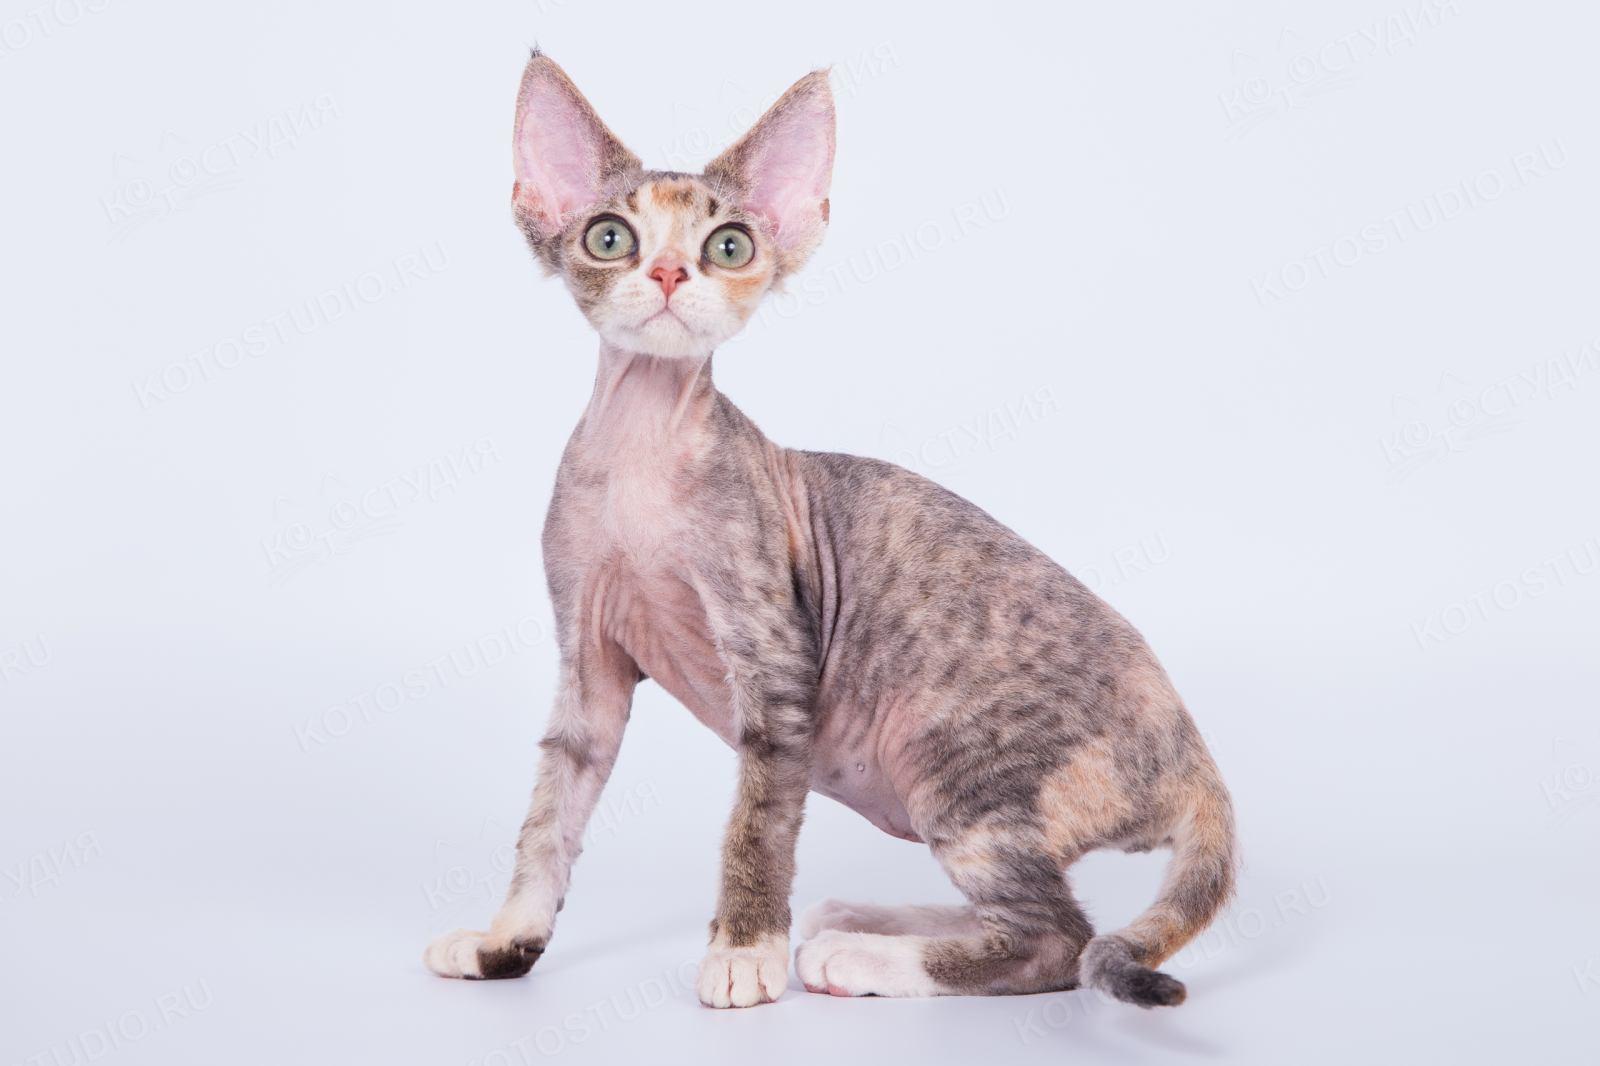 кошка девон рекс фото описание правила, помогающие